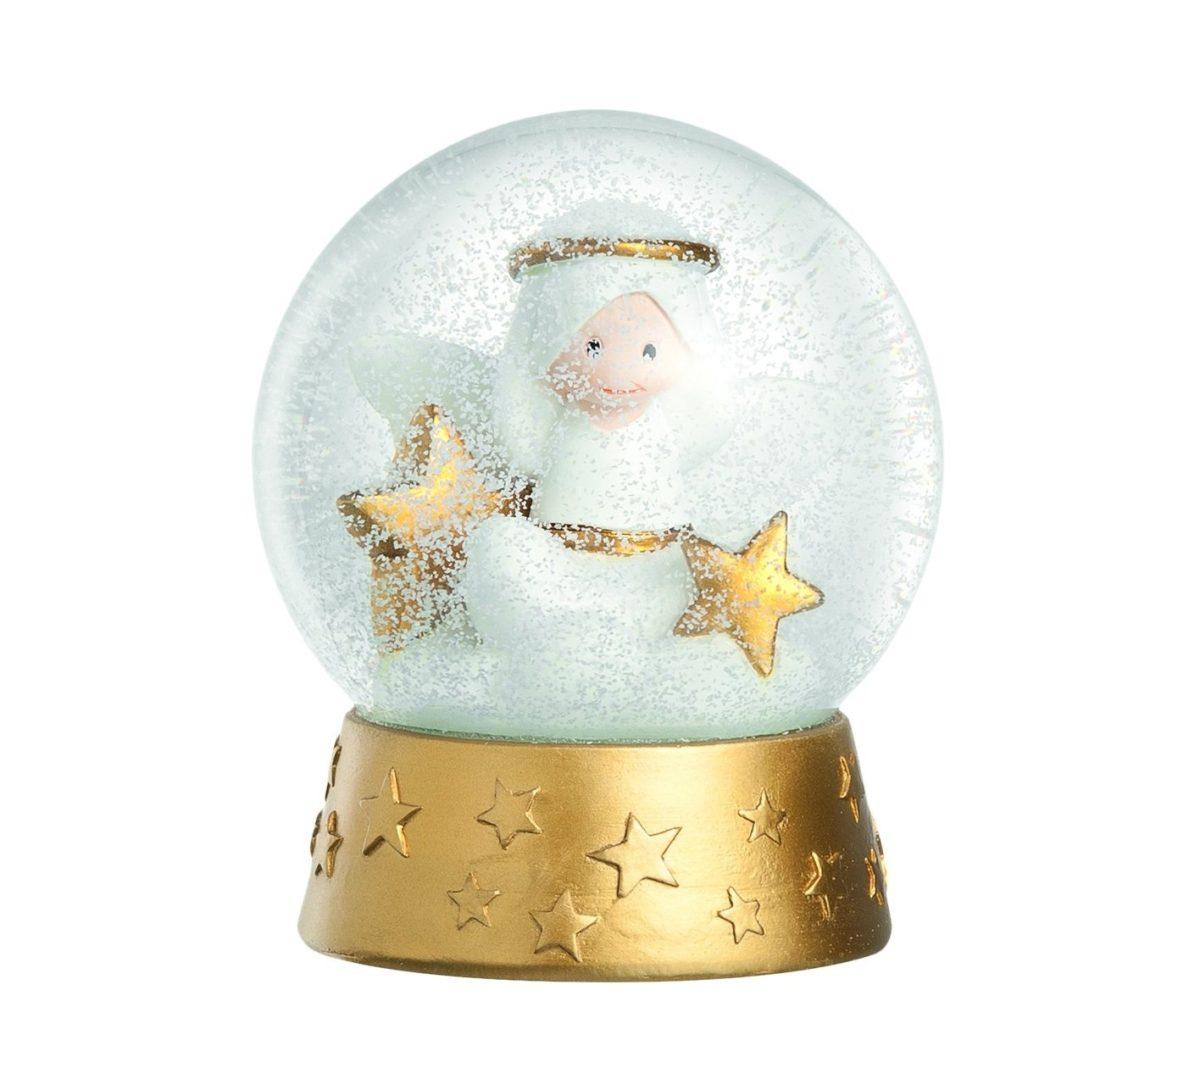 71wu91aIqTL. SL1417  1200x1068 - Glob de zăpadă Aurora (L029878)